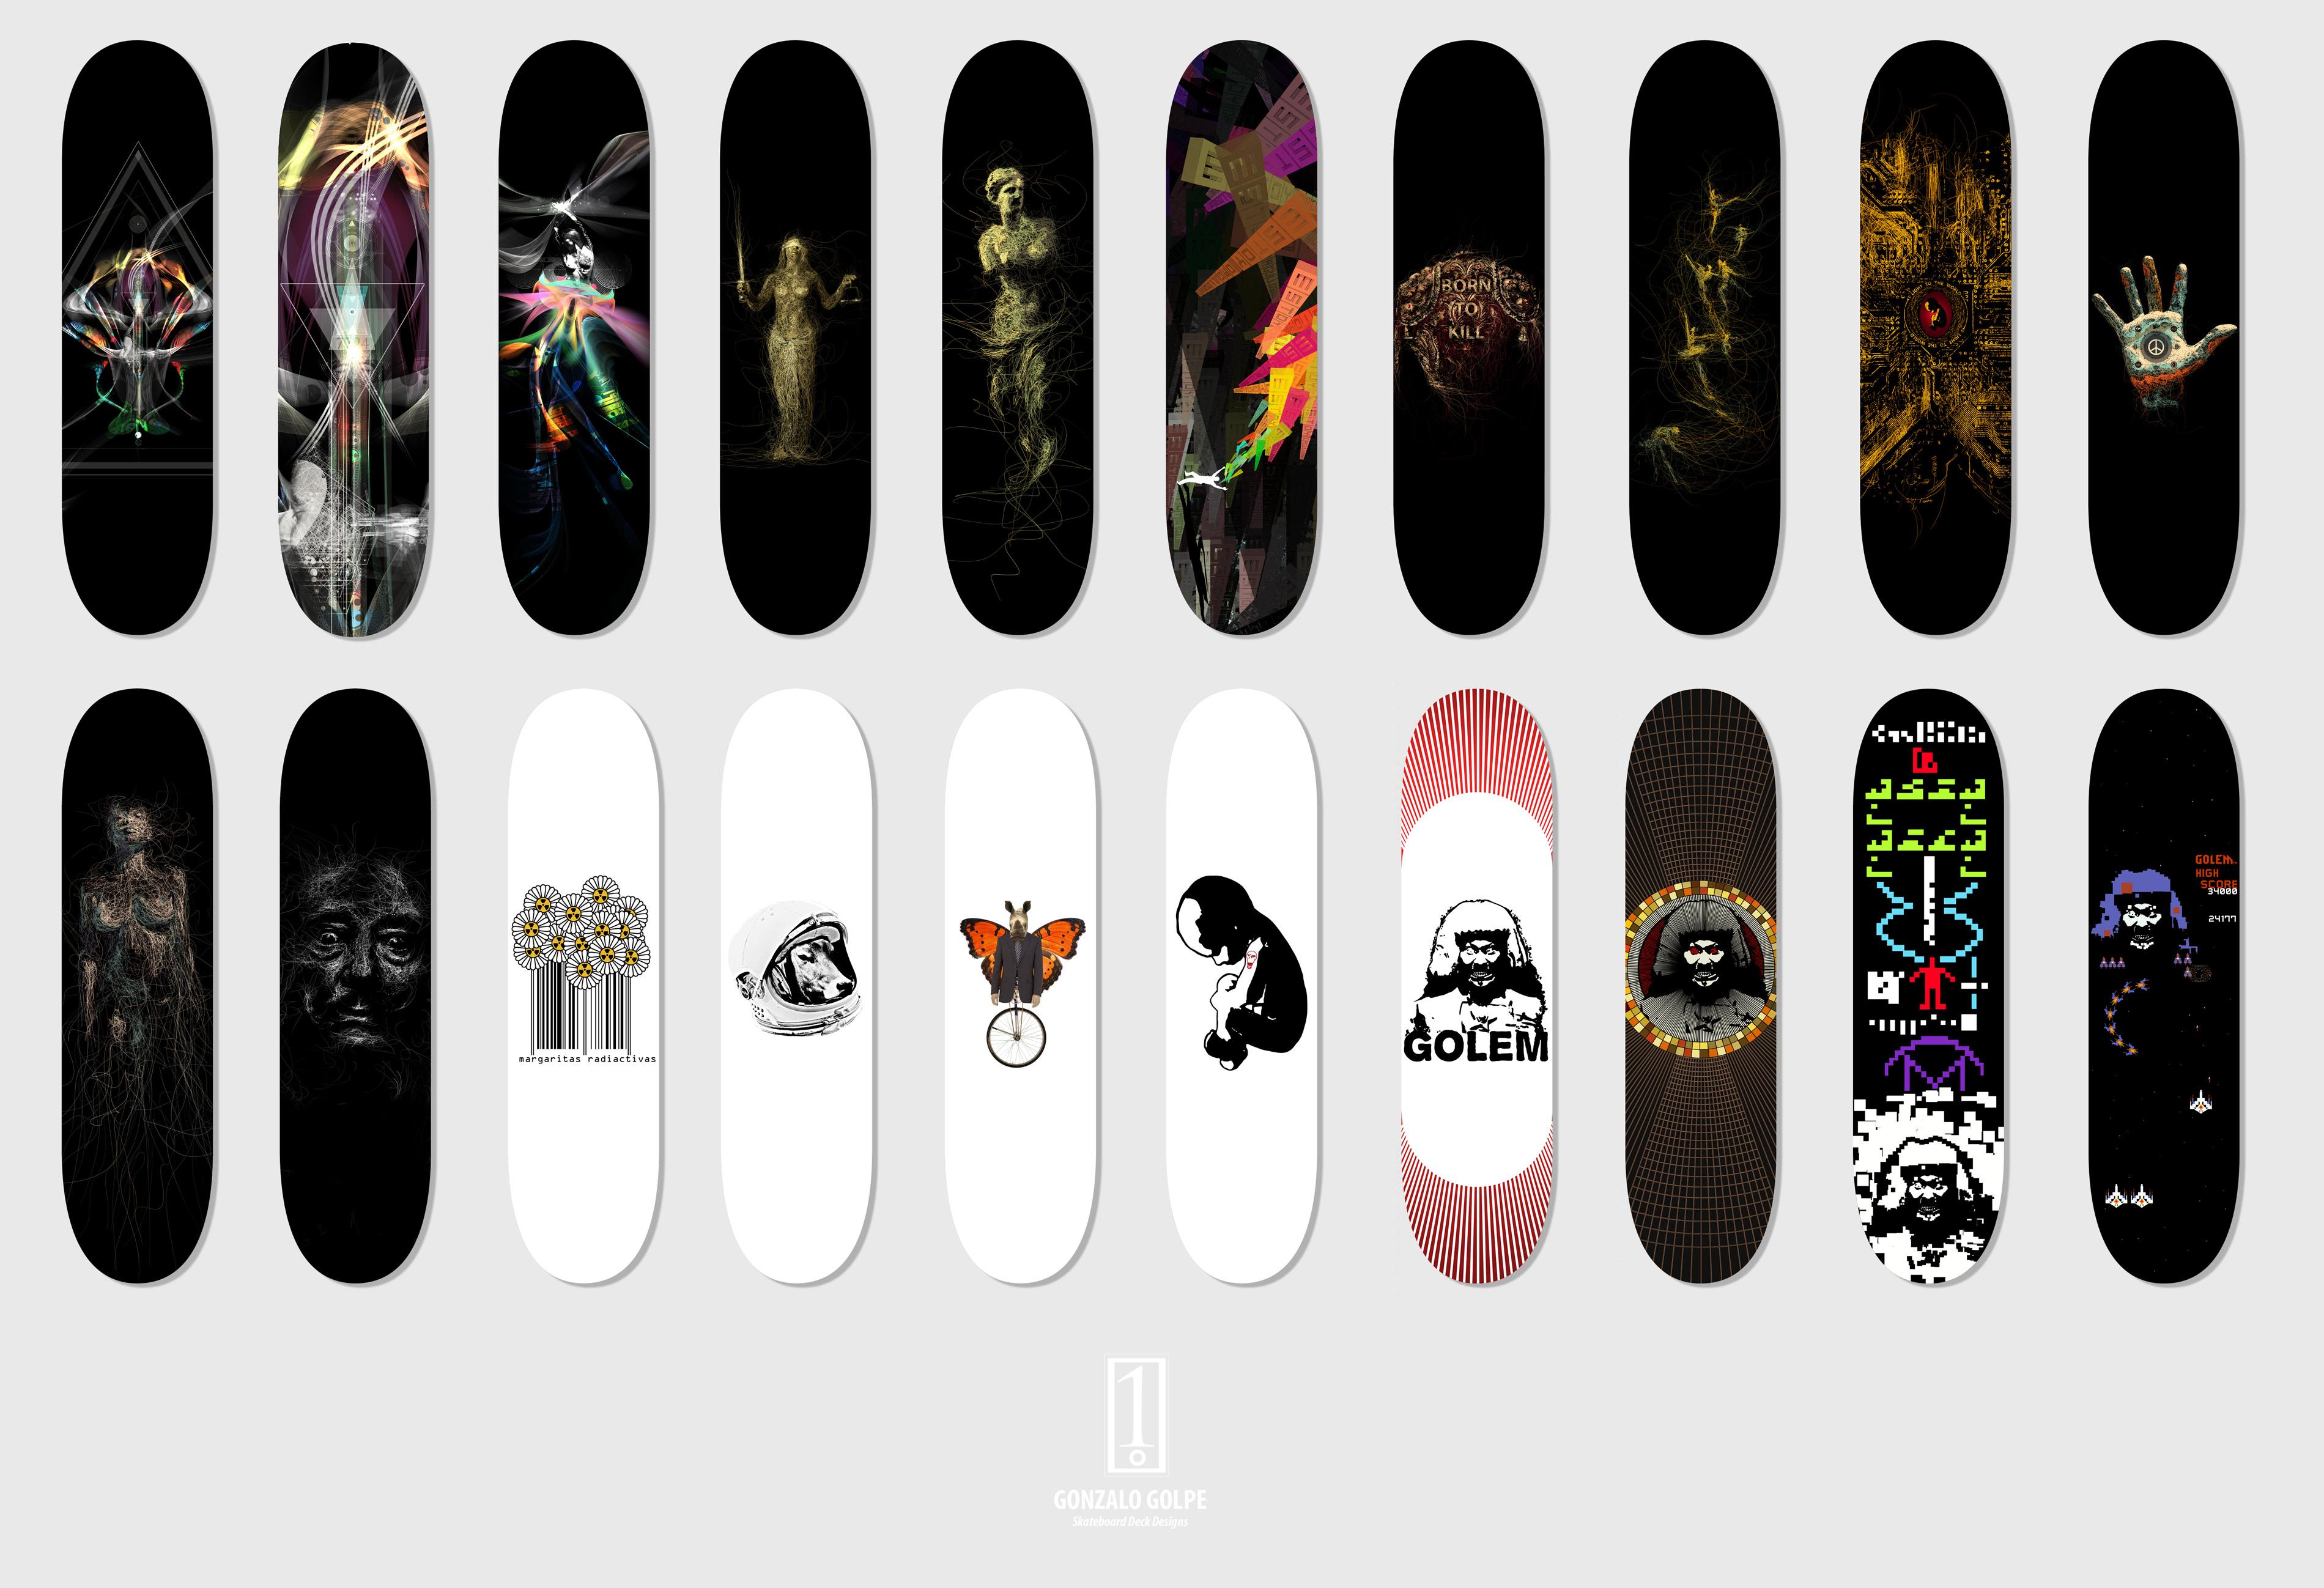 skateboard decks design by golpeart on deviantart